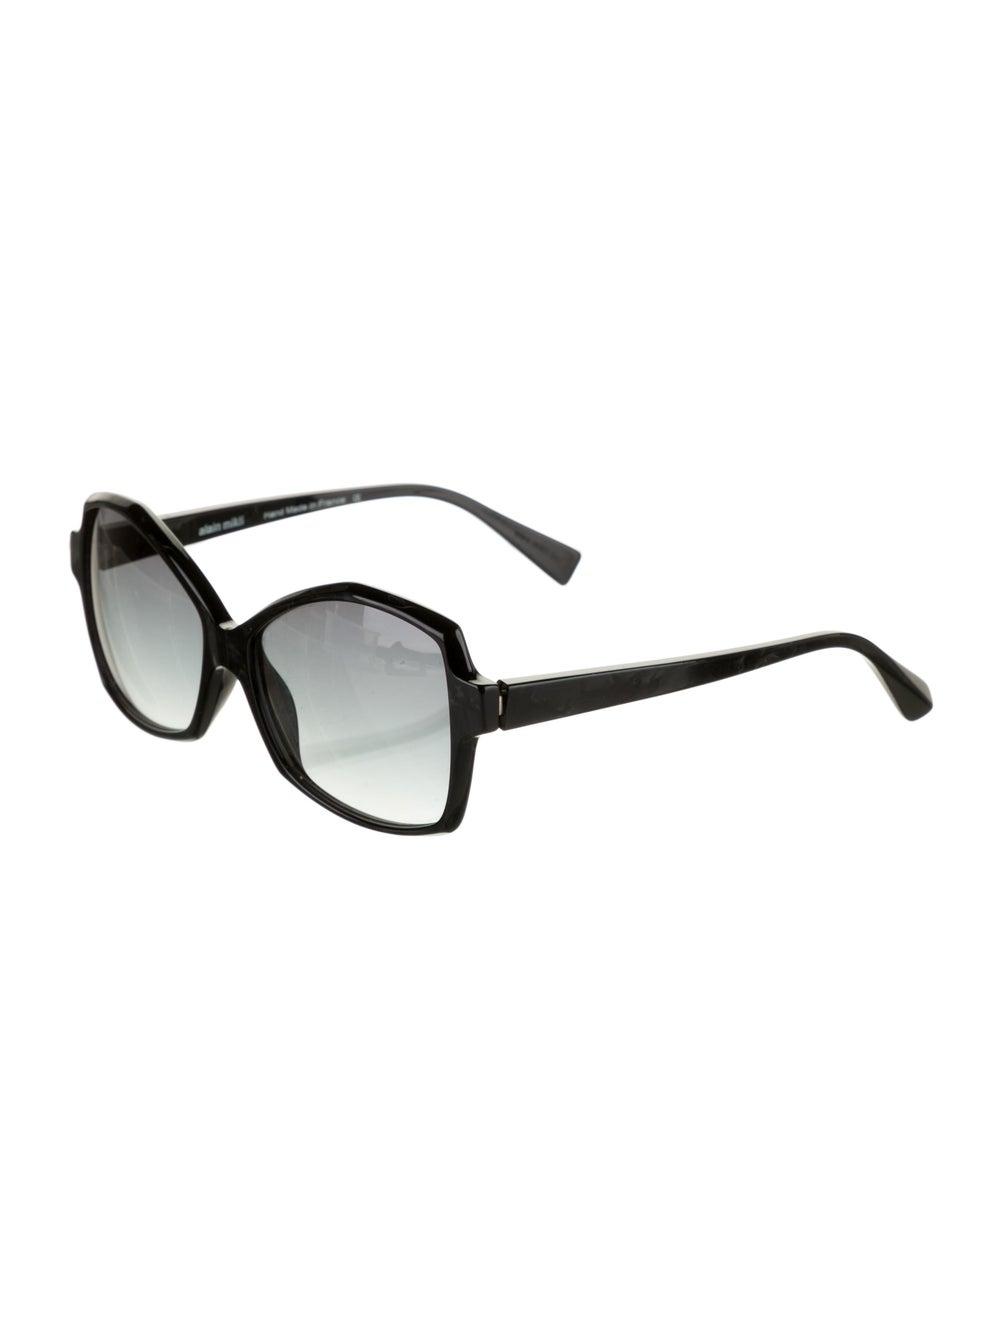 Alain Mikli Gradient Square Sunglasses Black - image 2